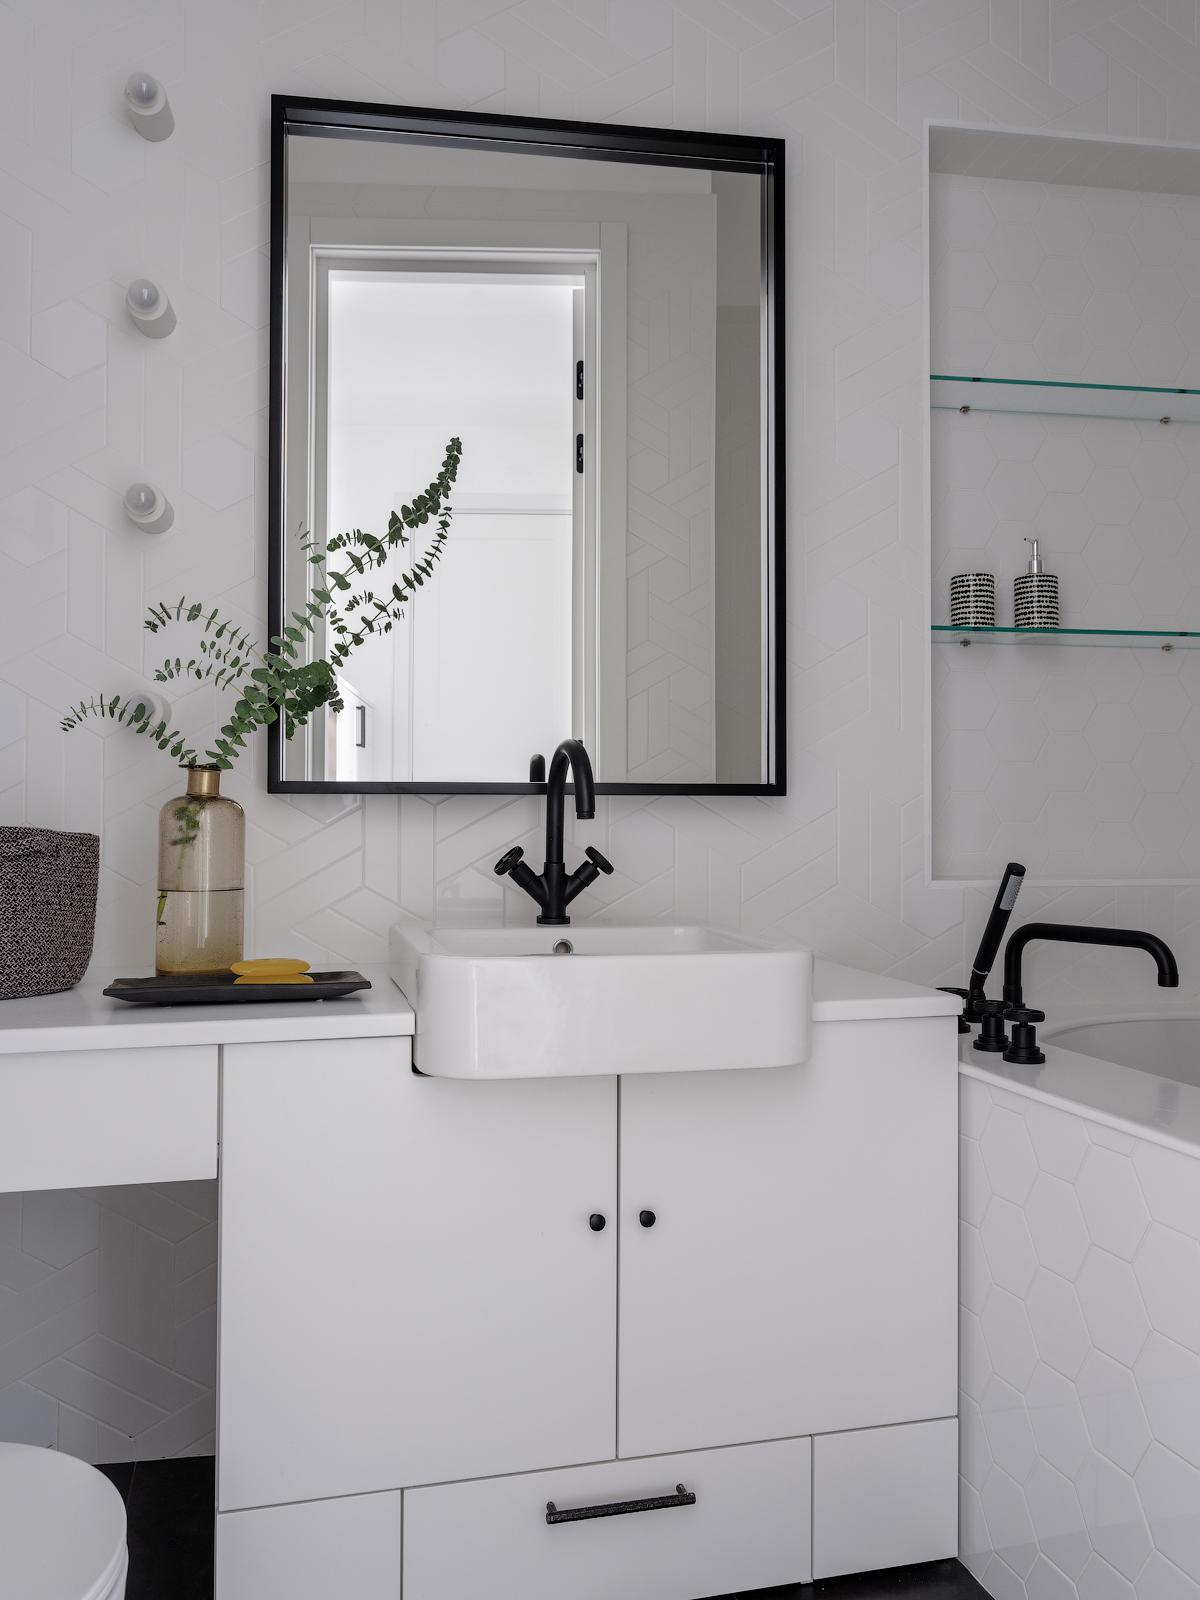 adelaparvu.com despre apartament 90 mp, design Minina Design, Foto Mikhail Loskutov (20)